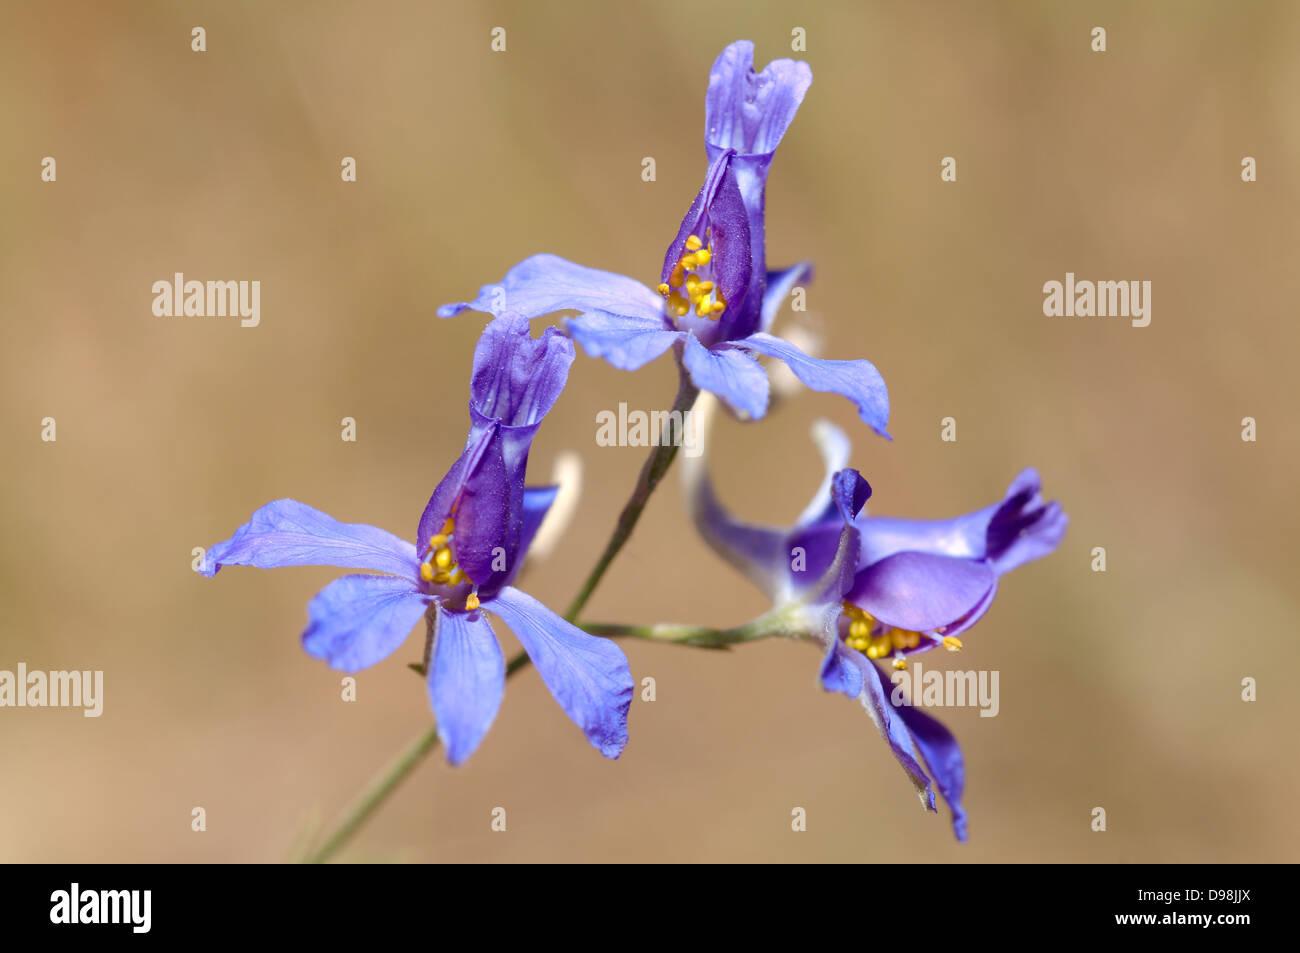 Forking Larkspur, Rocket-larkspur, or Field larkspur (Delphinium consolida) Crimea, Ukraine, Eastern Europe - Stock Image